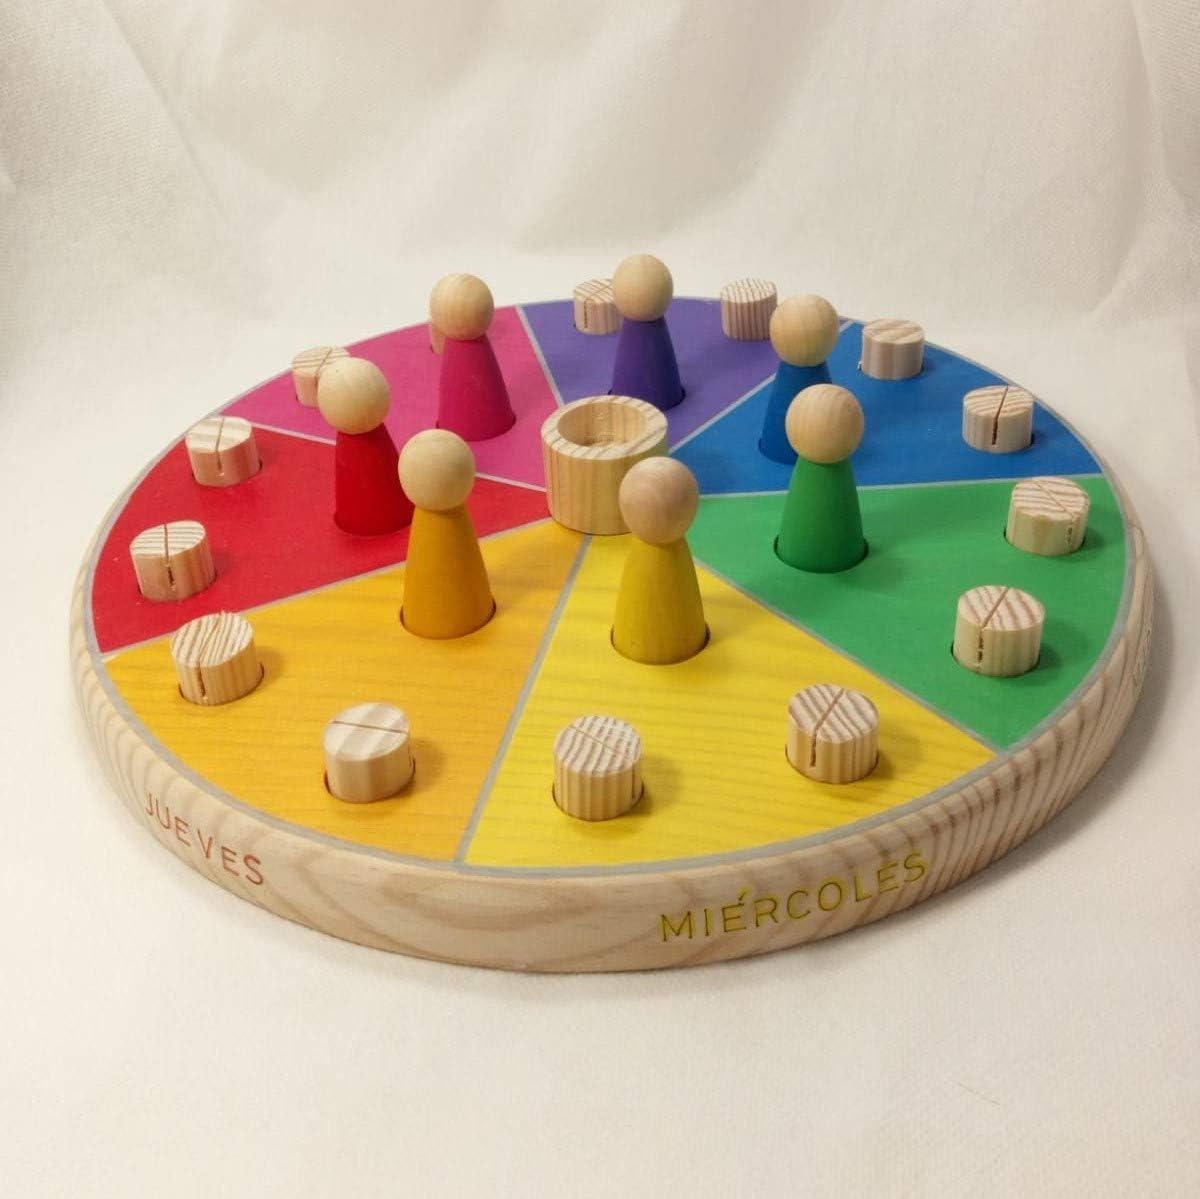 dias en Castellano ludimat Calendario semanal Eventos Grande Montessori Waldorf